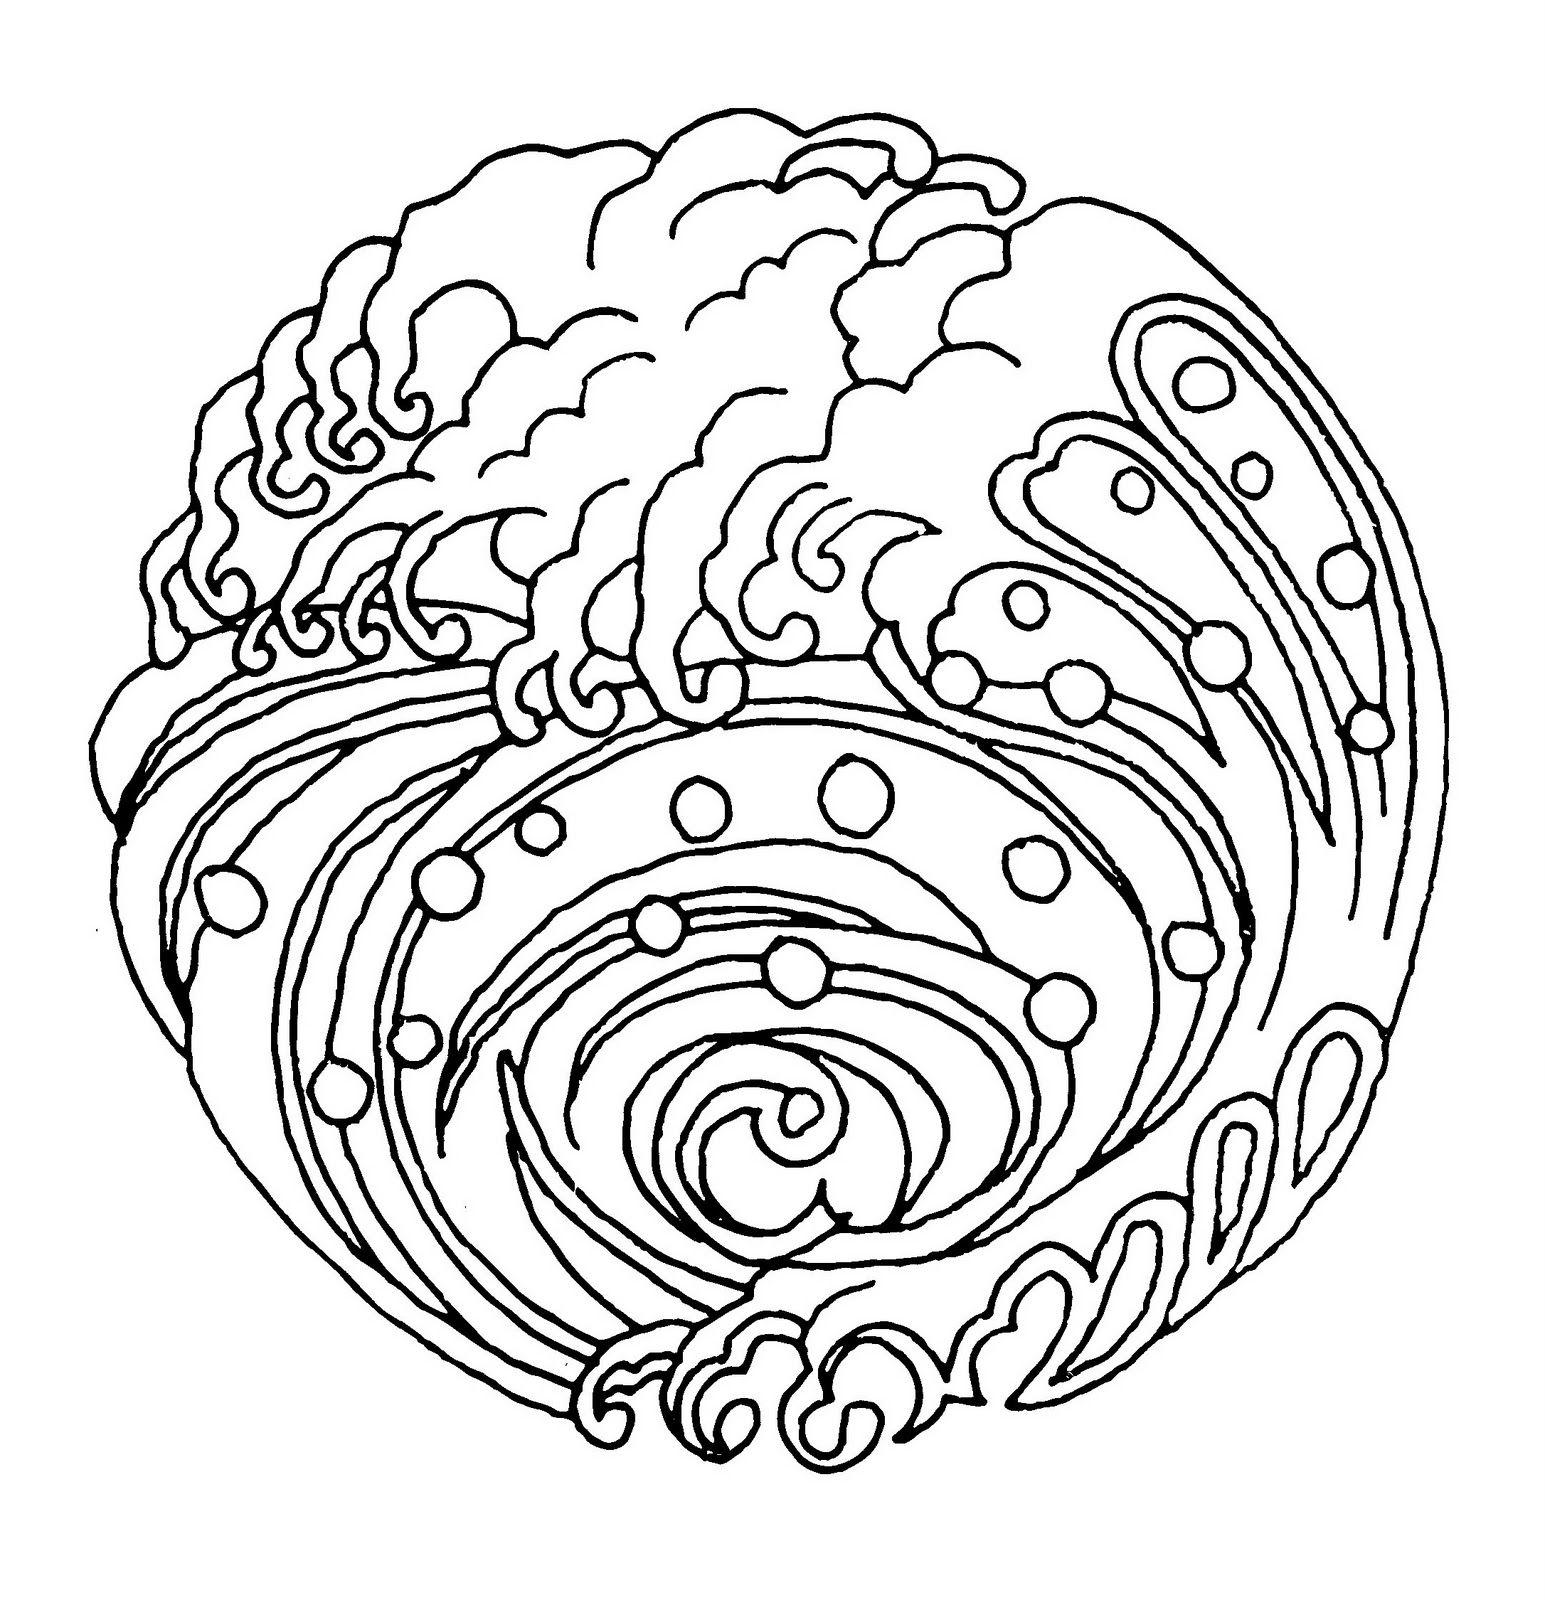 Mandala coloring pages pinterest - Wolf Mandala Coloring Pages Rgda Jpg 1545 1600